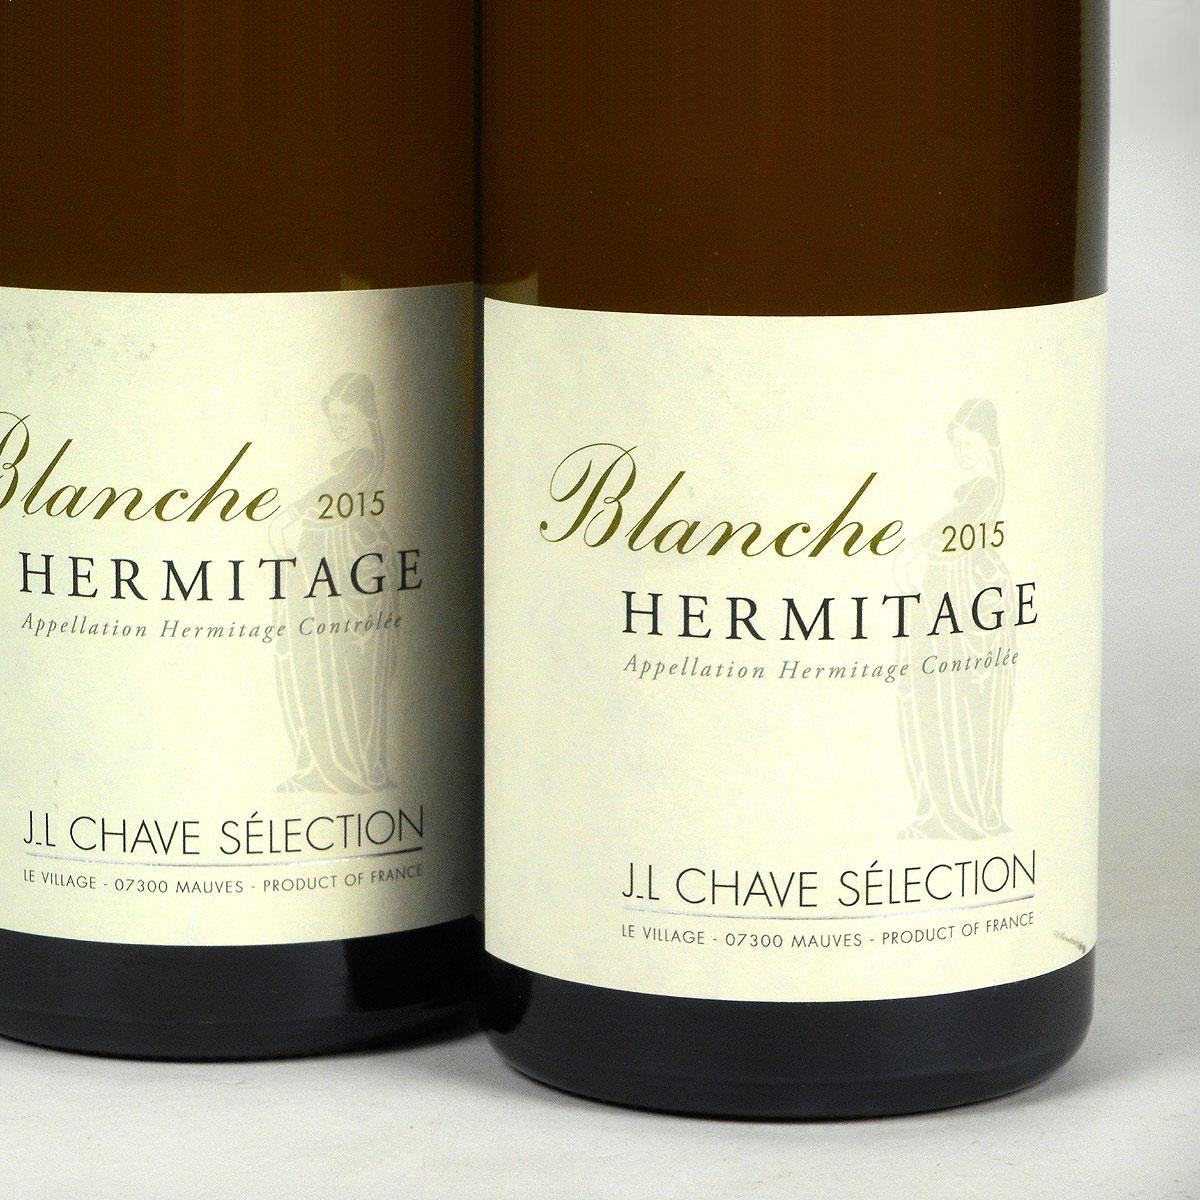 Hermitage: Jean-Louis Chave Sélection 'Blanche' 2015